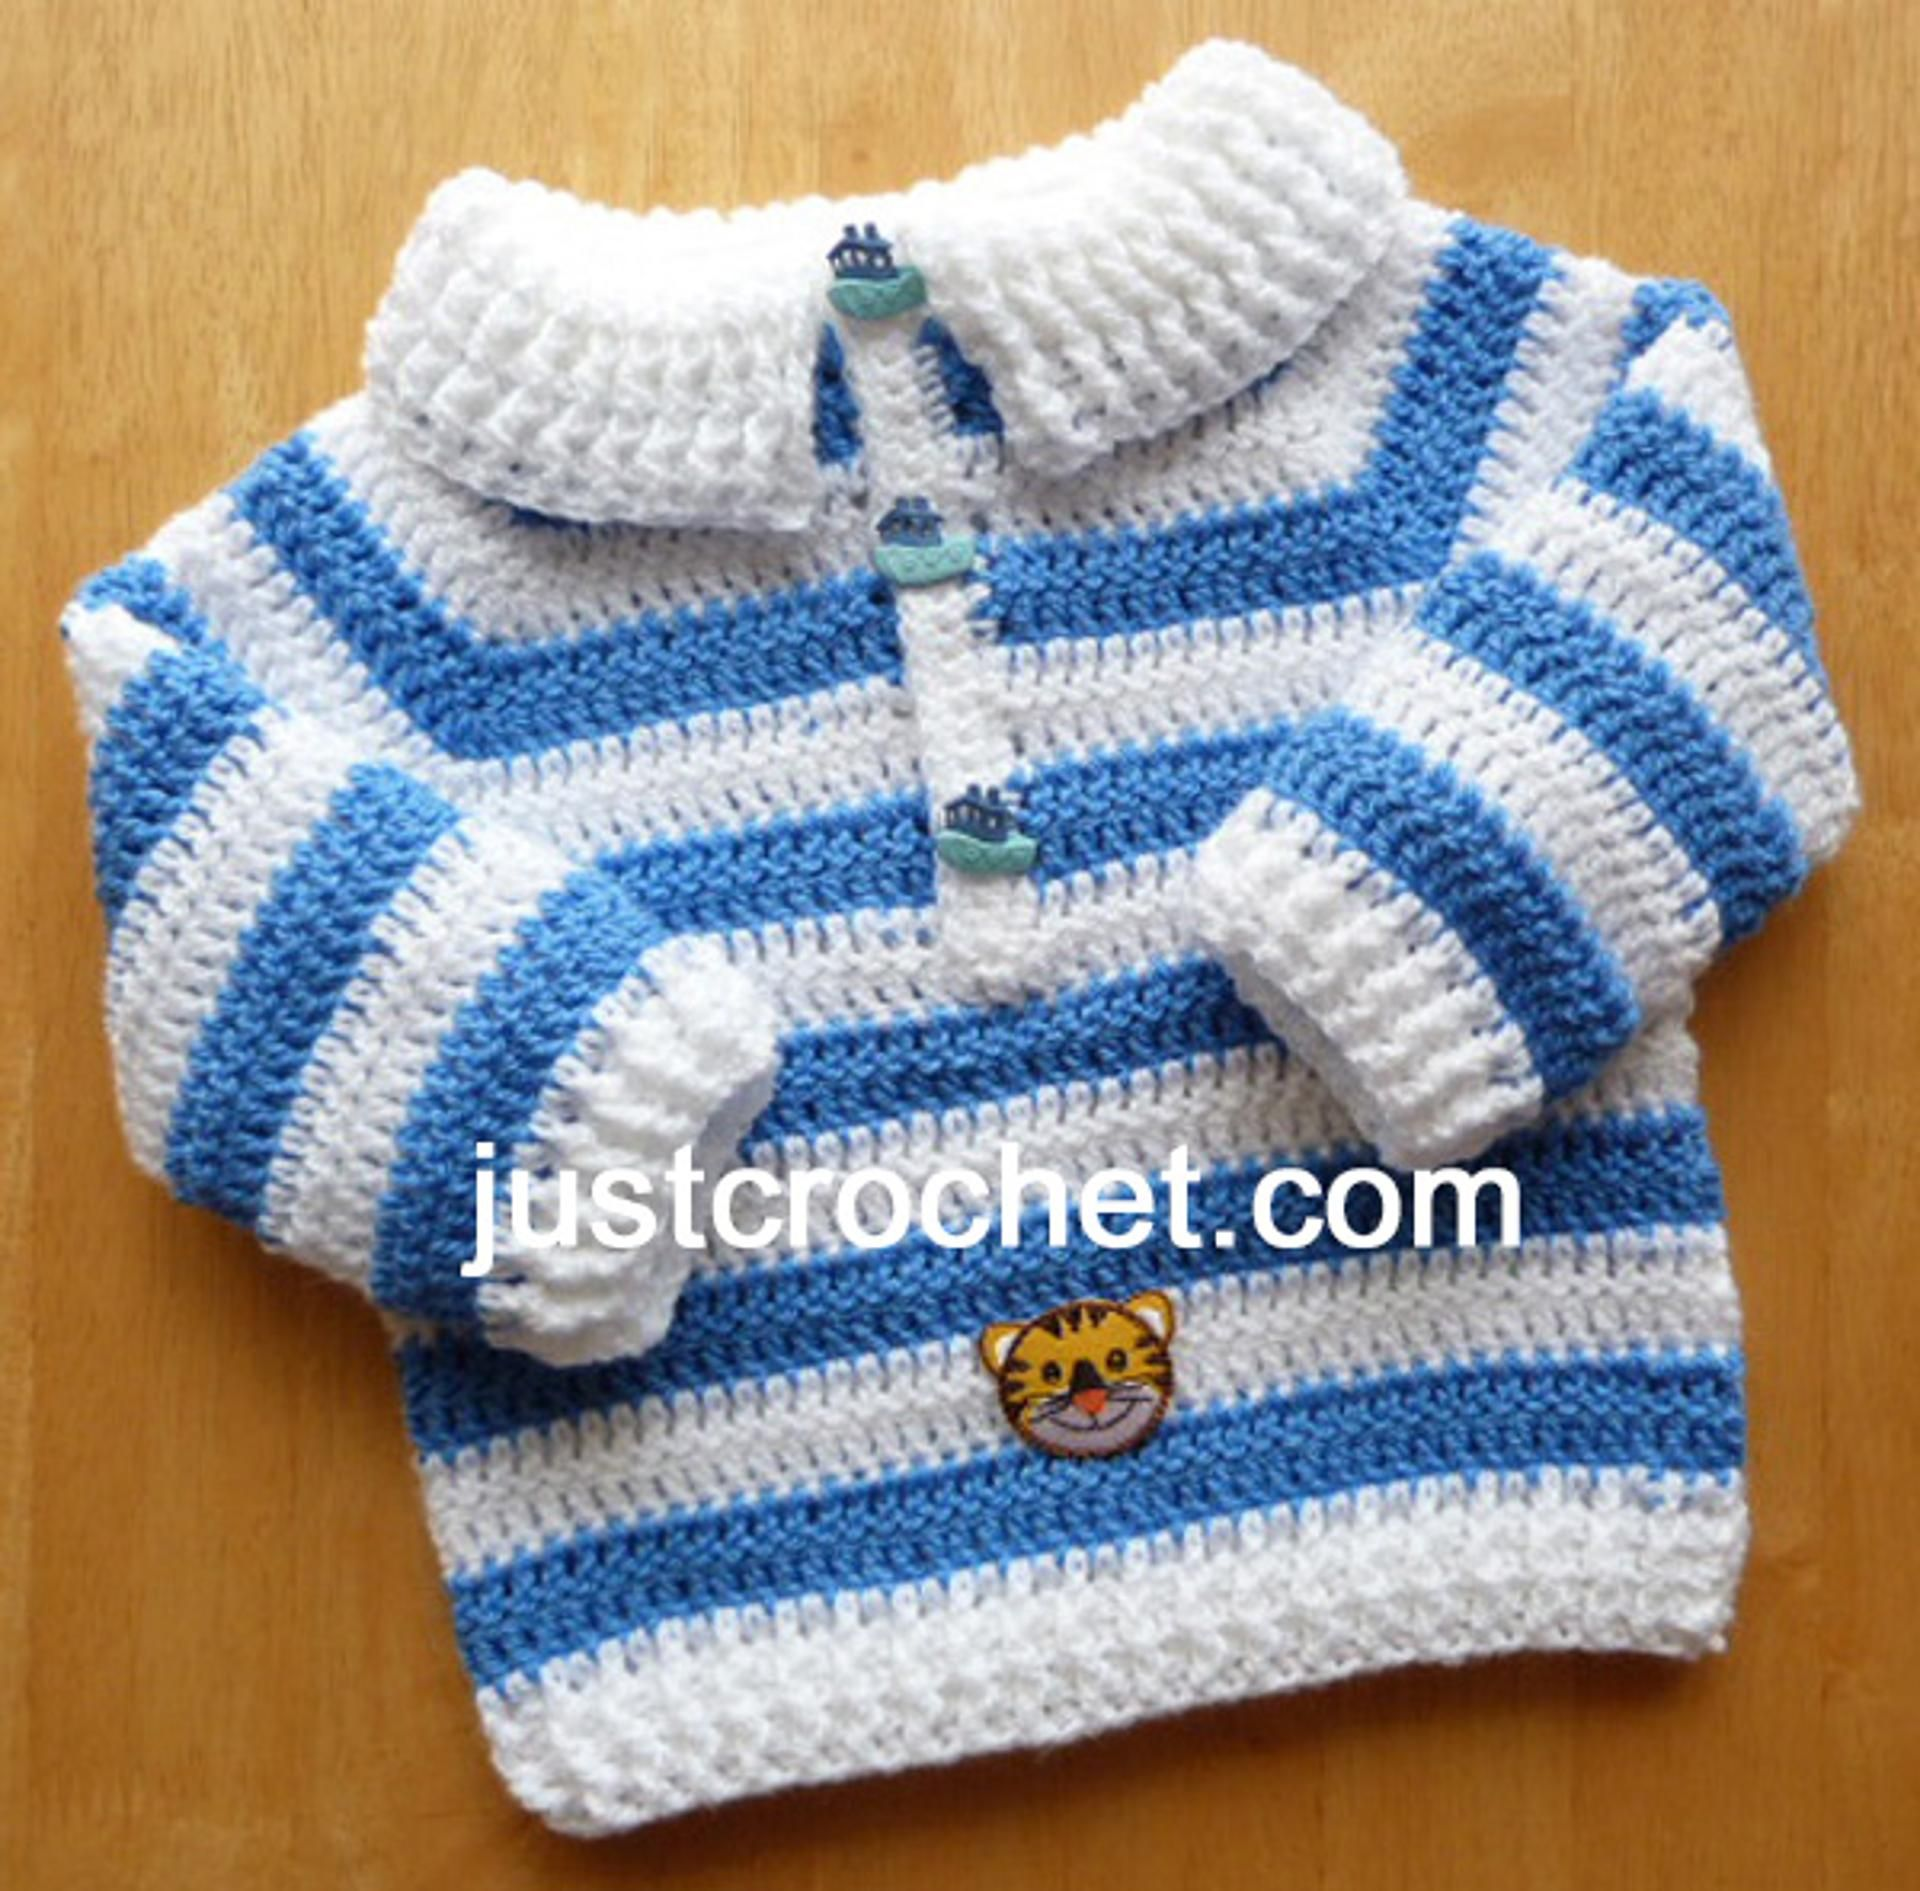 fjc122-Collared Sweater Baby Crochet Pattern | Craftsy | Crochet ...